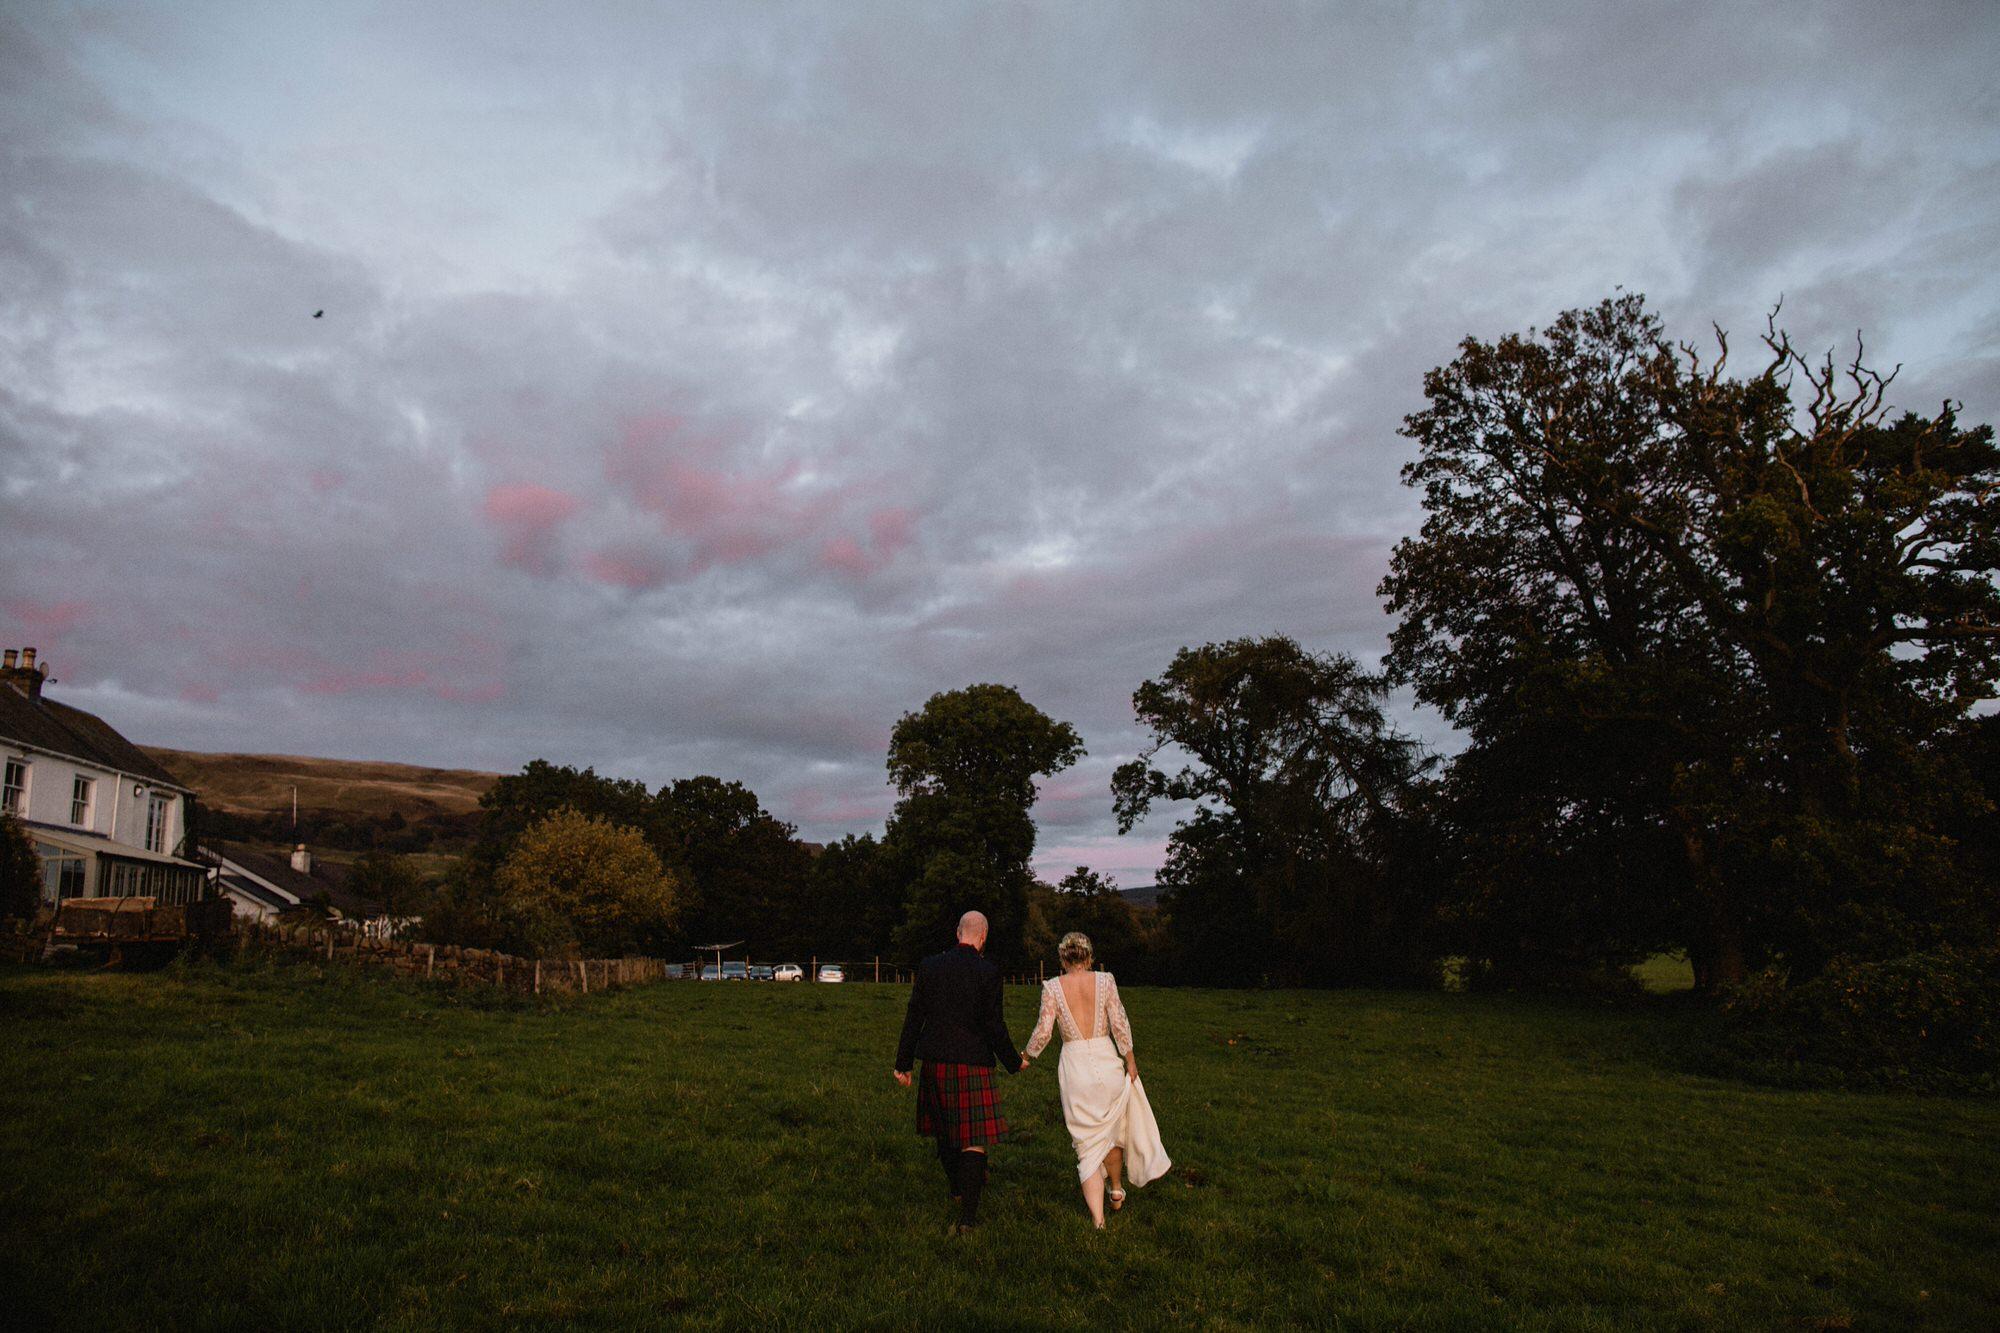 071 TIN SHED KNOCKRAICH WEDDING AUTUMN ZOE ALEXANDRA PHOTOGRAPHY